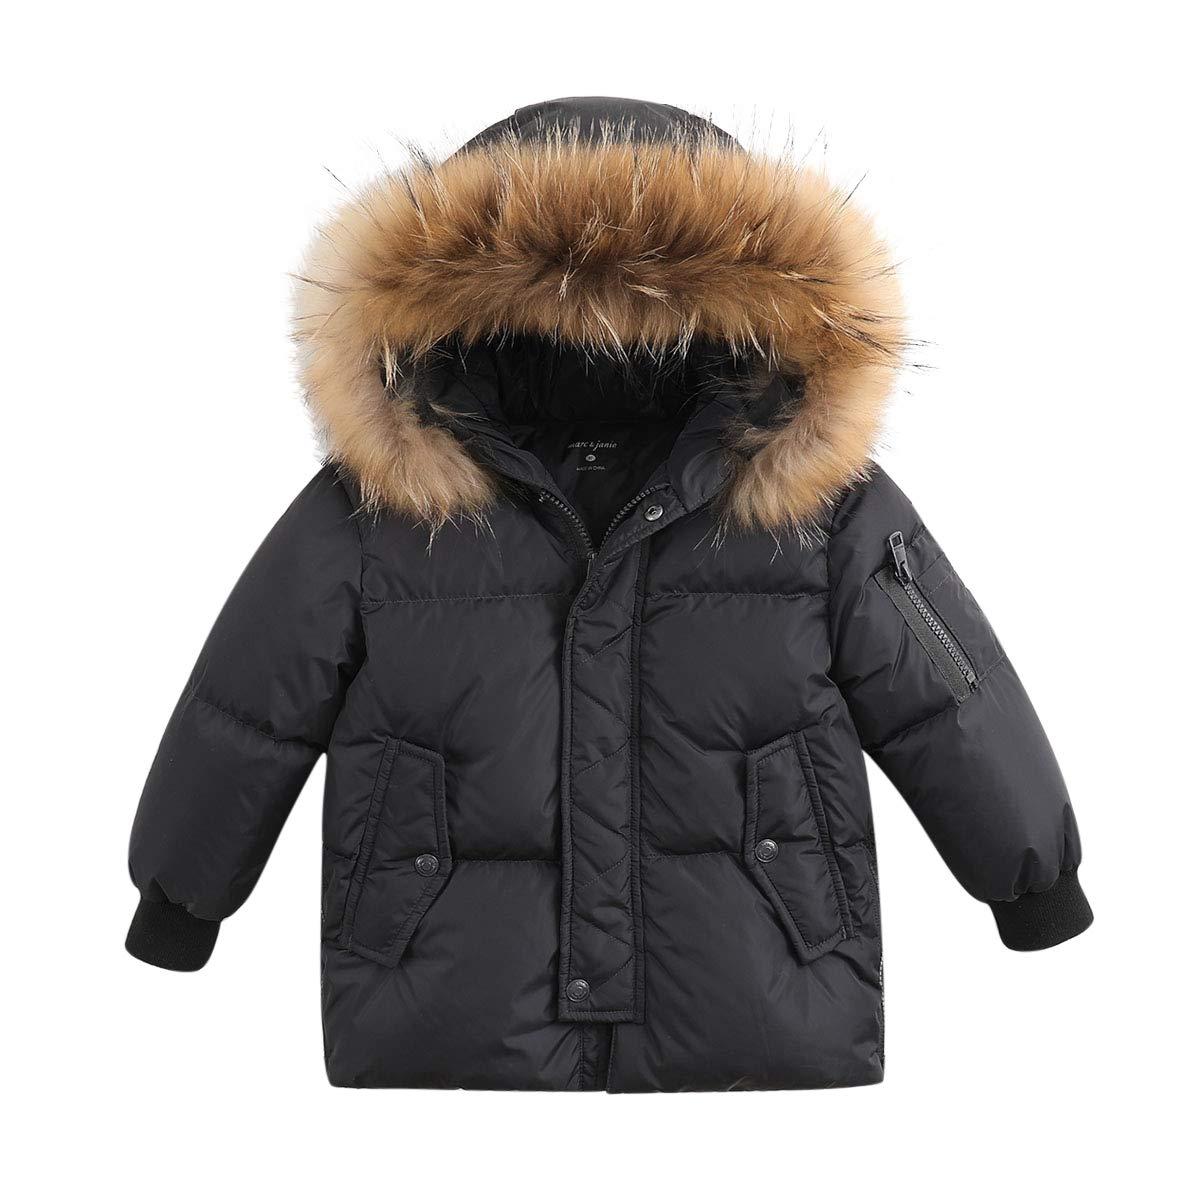 marc janie Boys' Lightweight Packable Hooded Down Puffer Jacket Raccoon Fur Collar Mid-Long